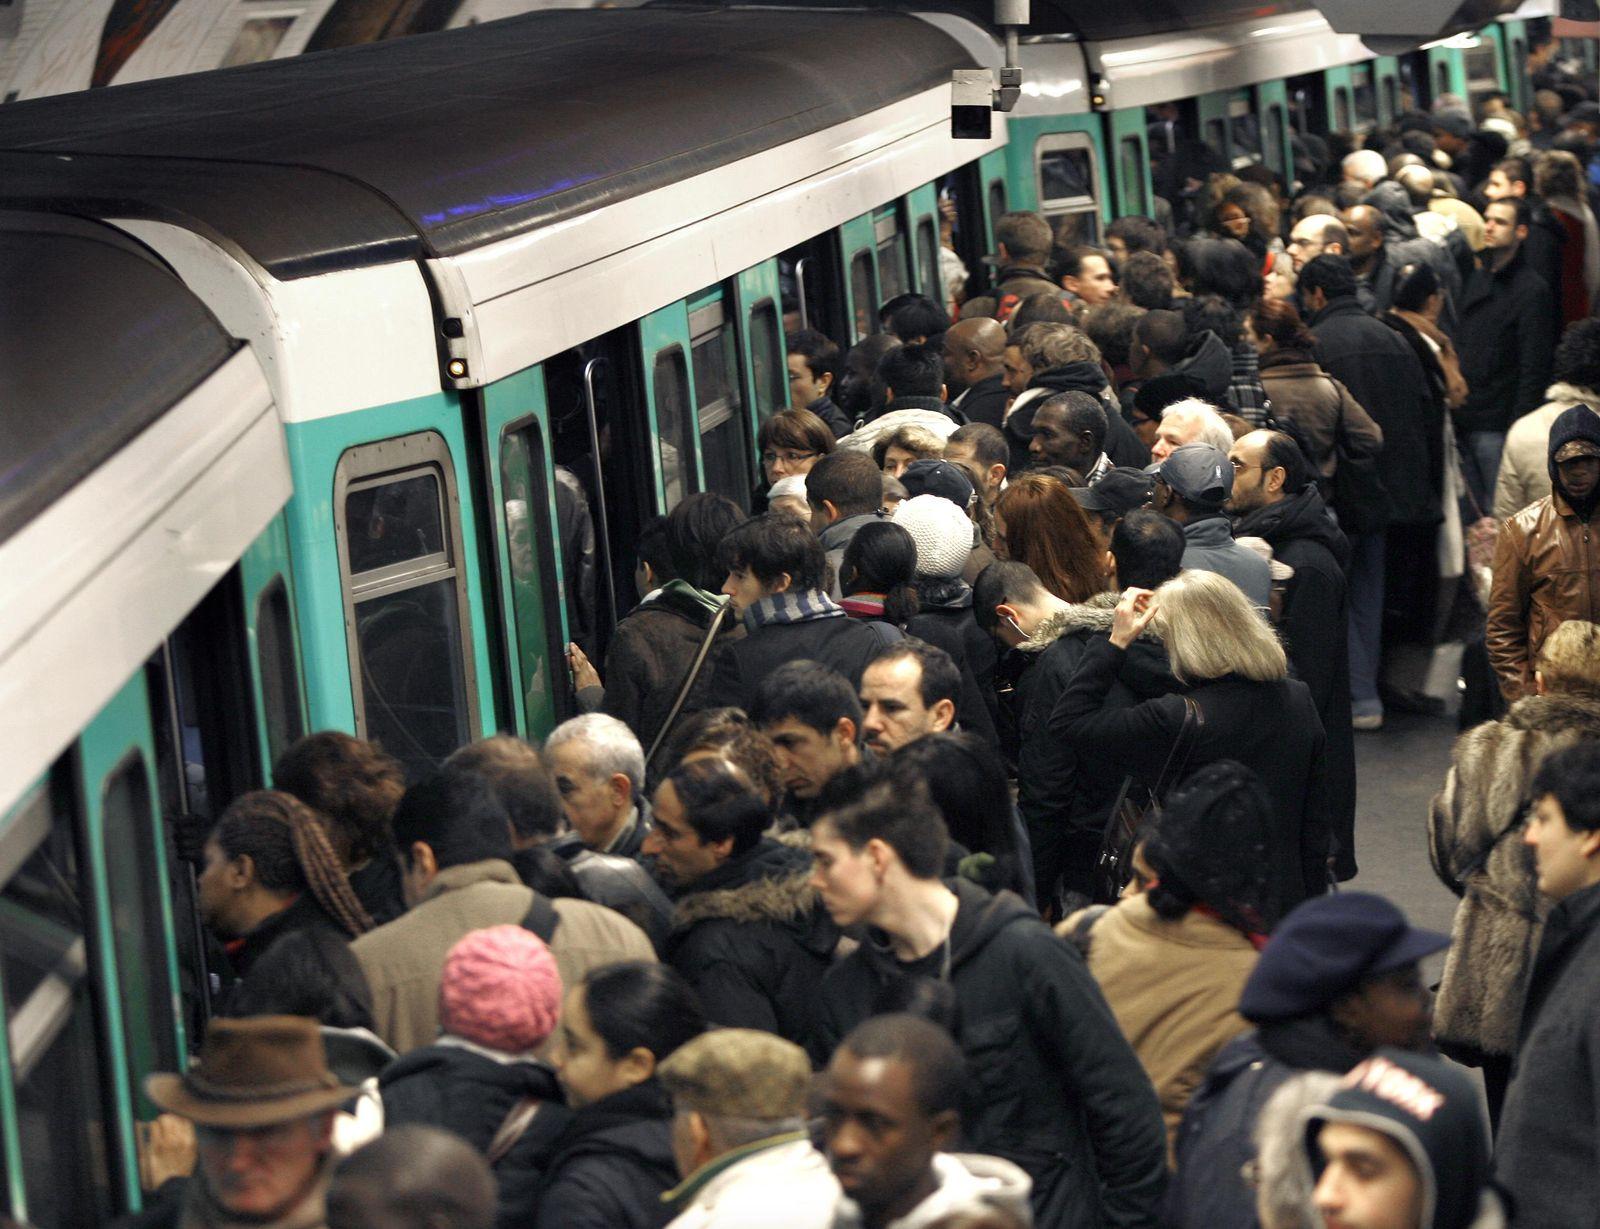 Framkreich / Metro / Paris